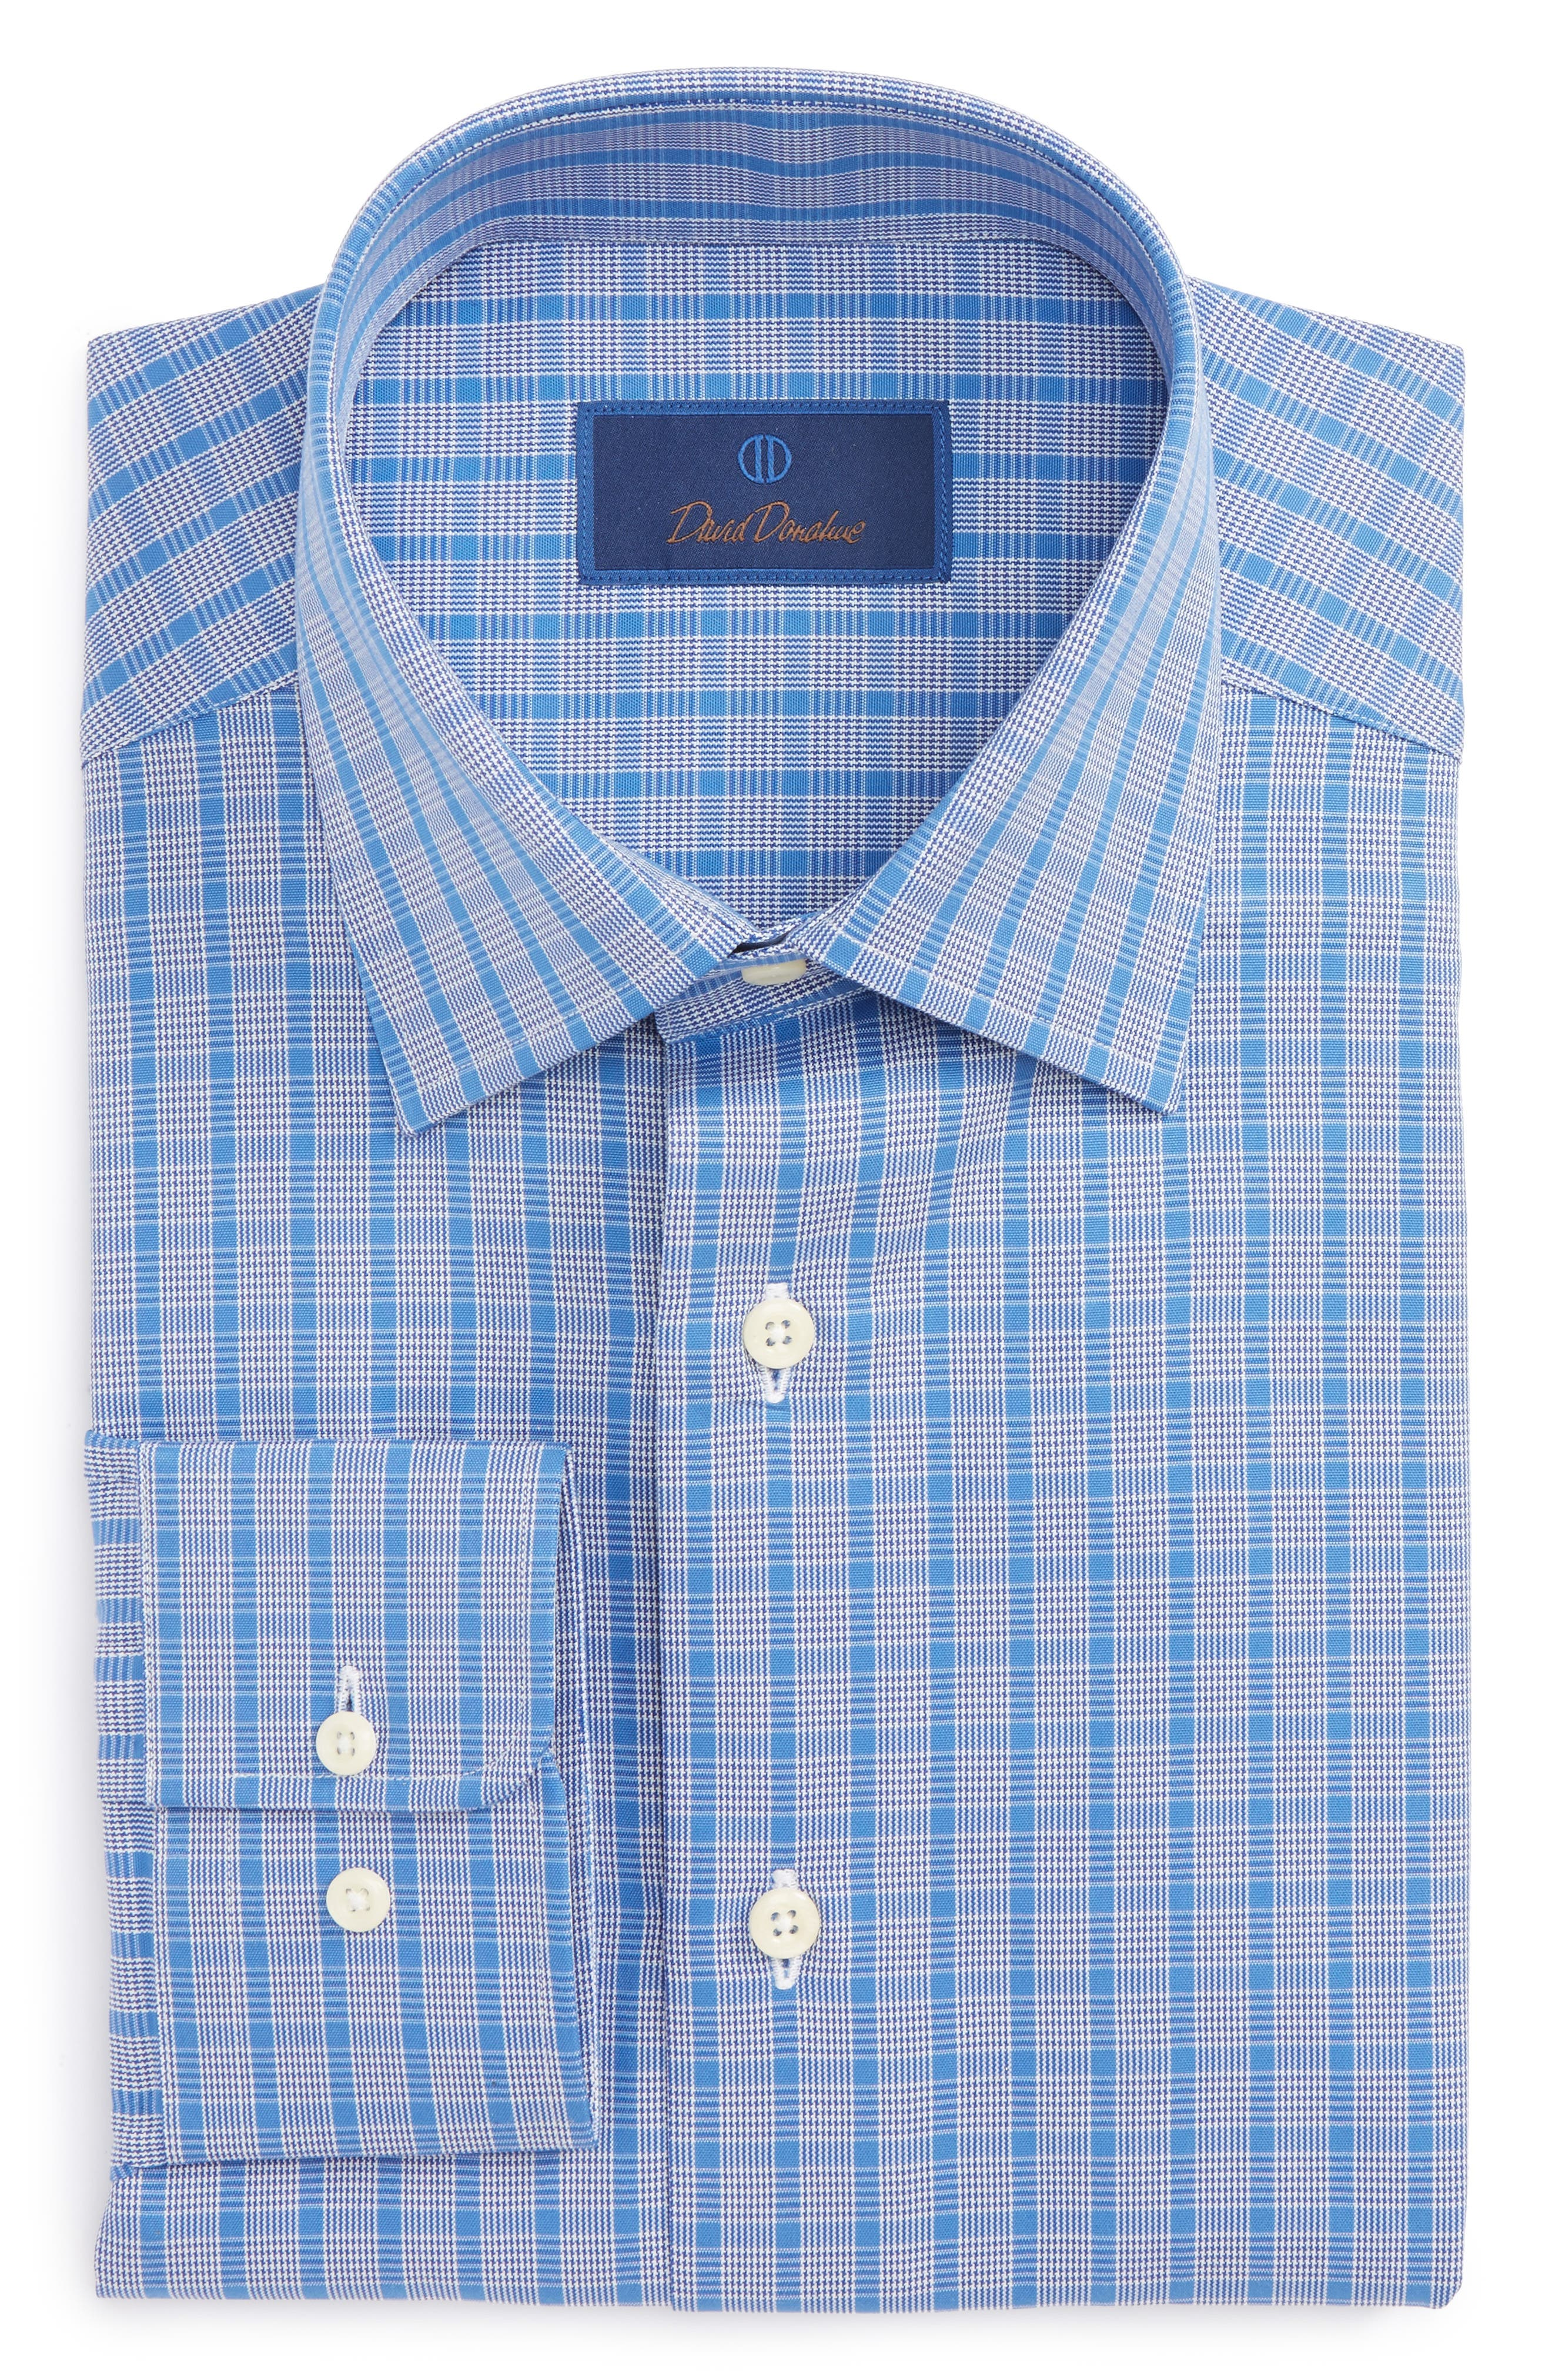 Regular Fit Plaid Dress Shirt,                         Main,                         color, Blue